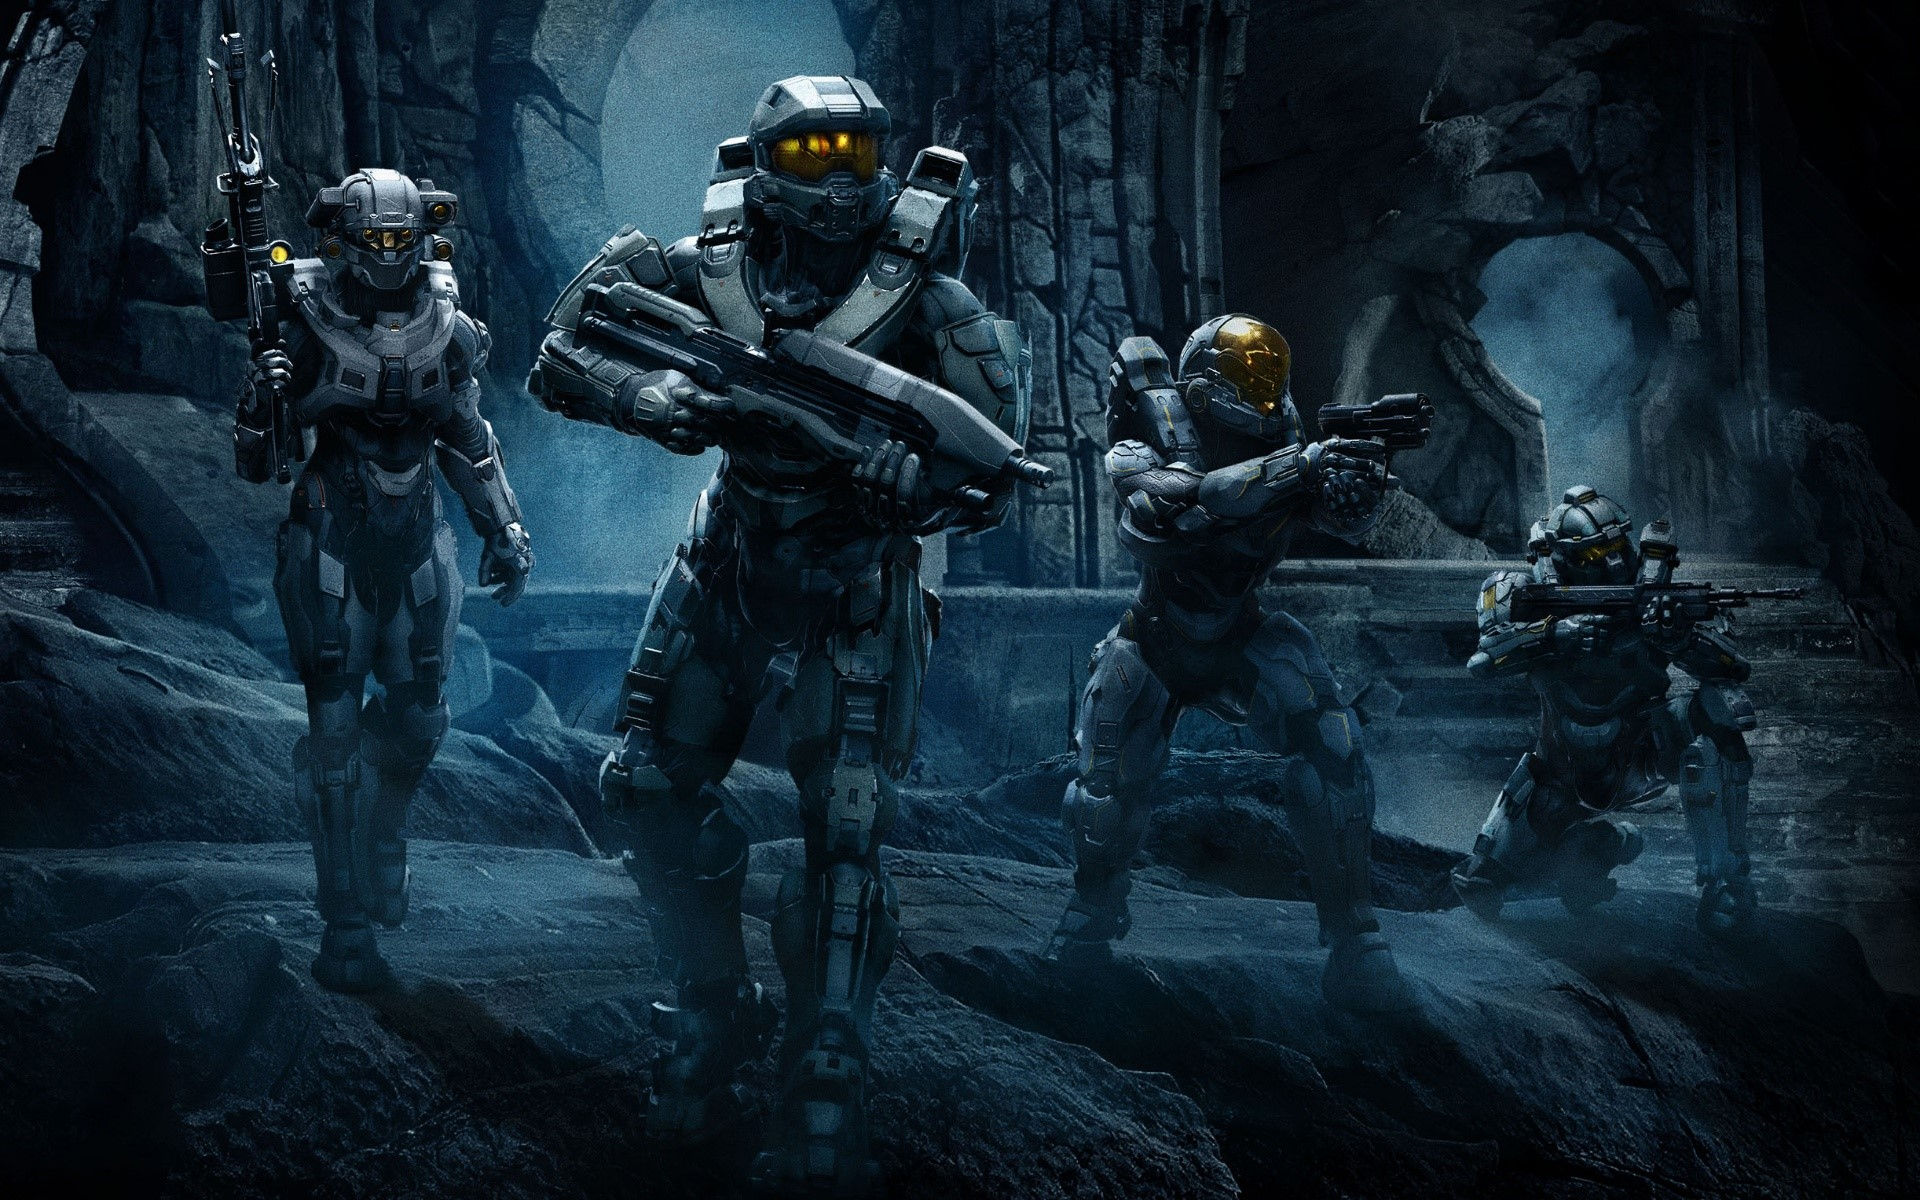 Wallpaper Halo 5 Guardians Team Chief